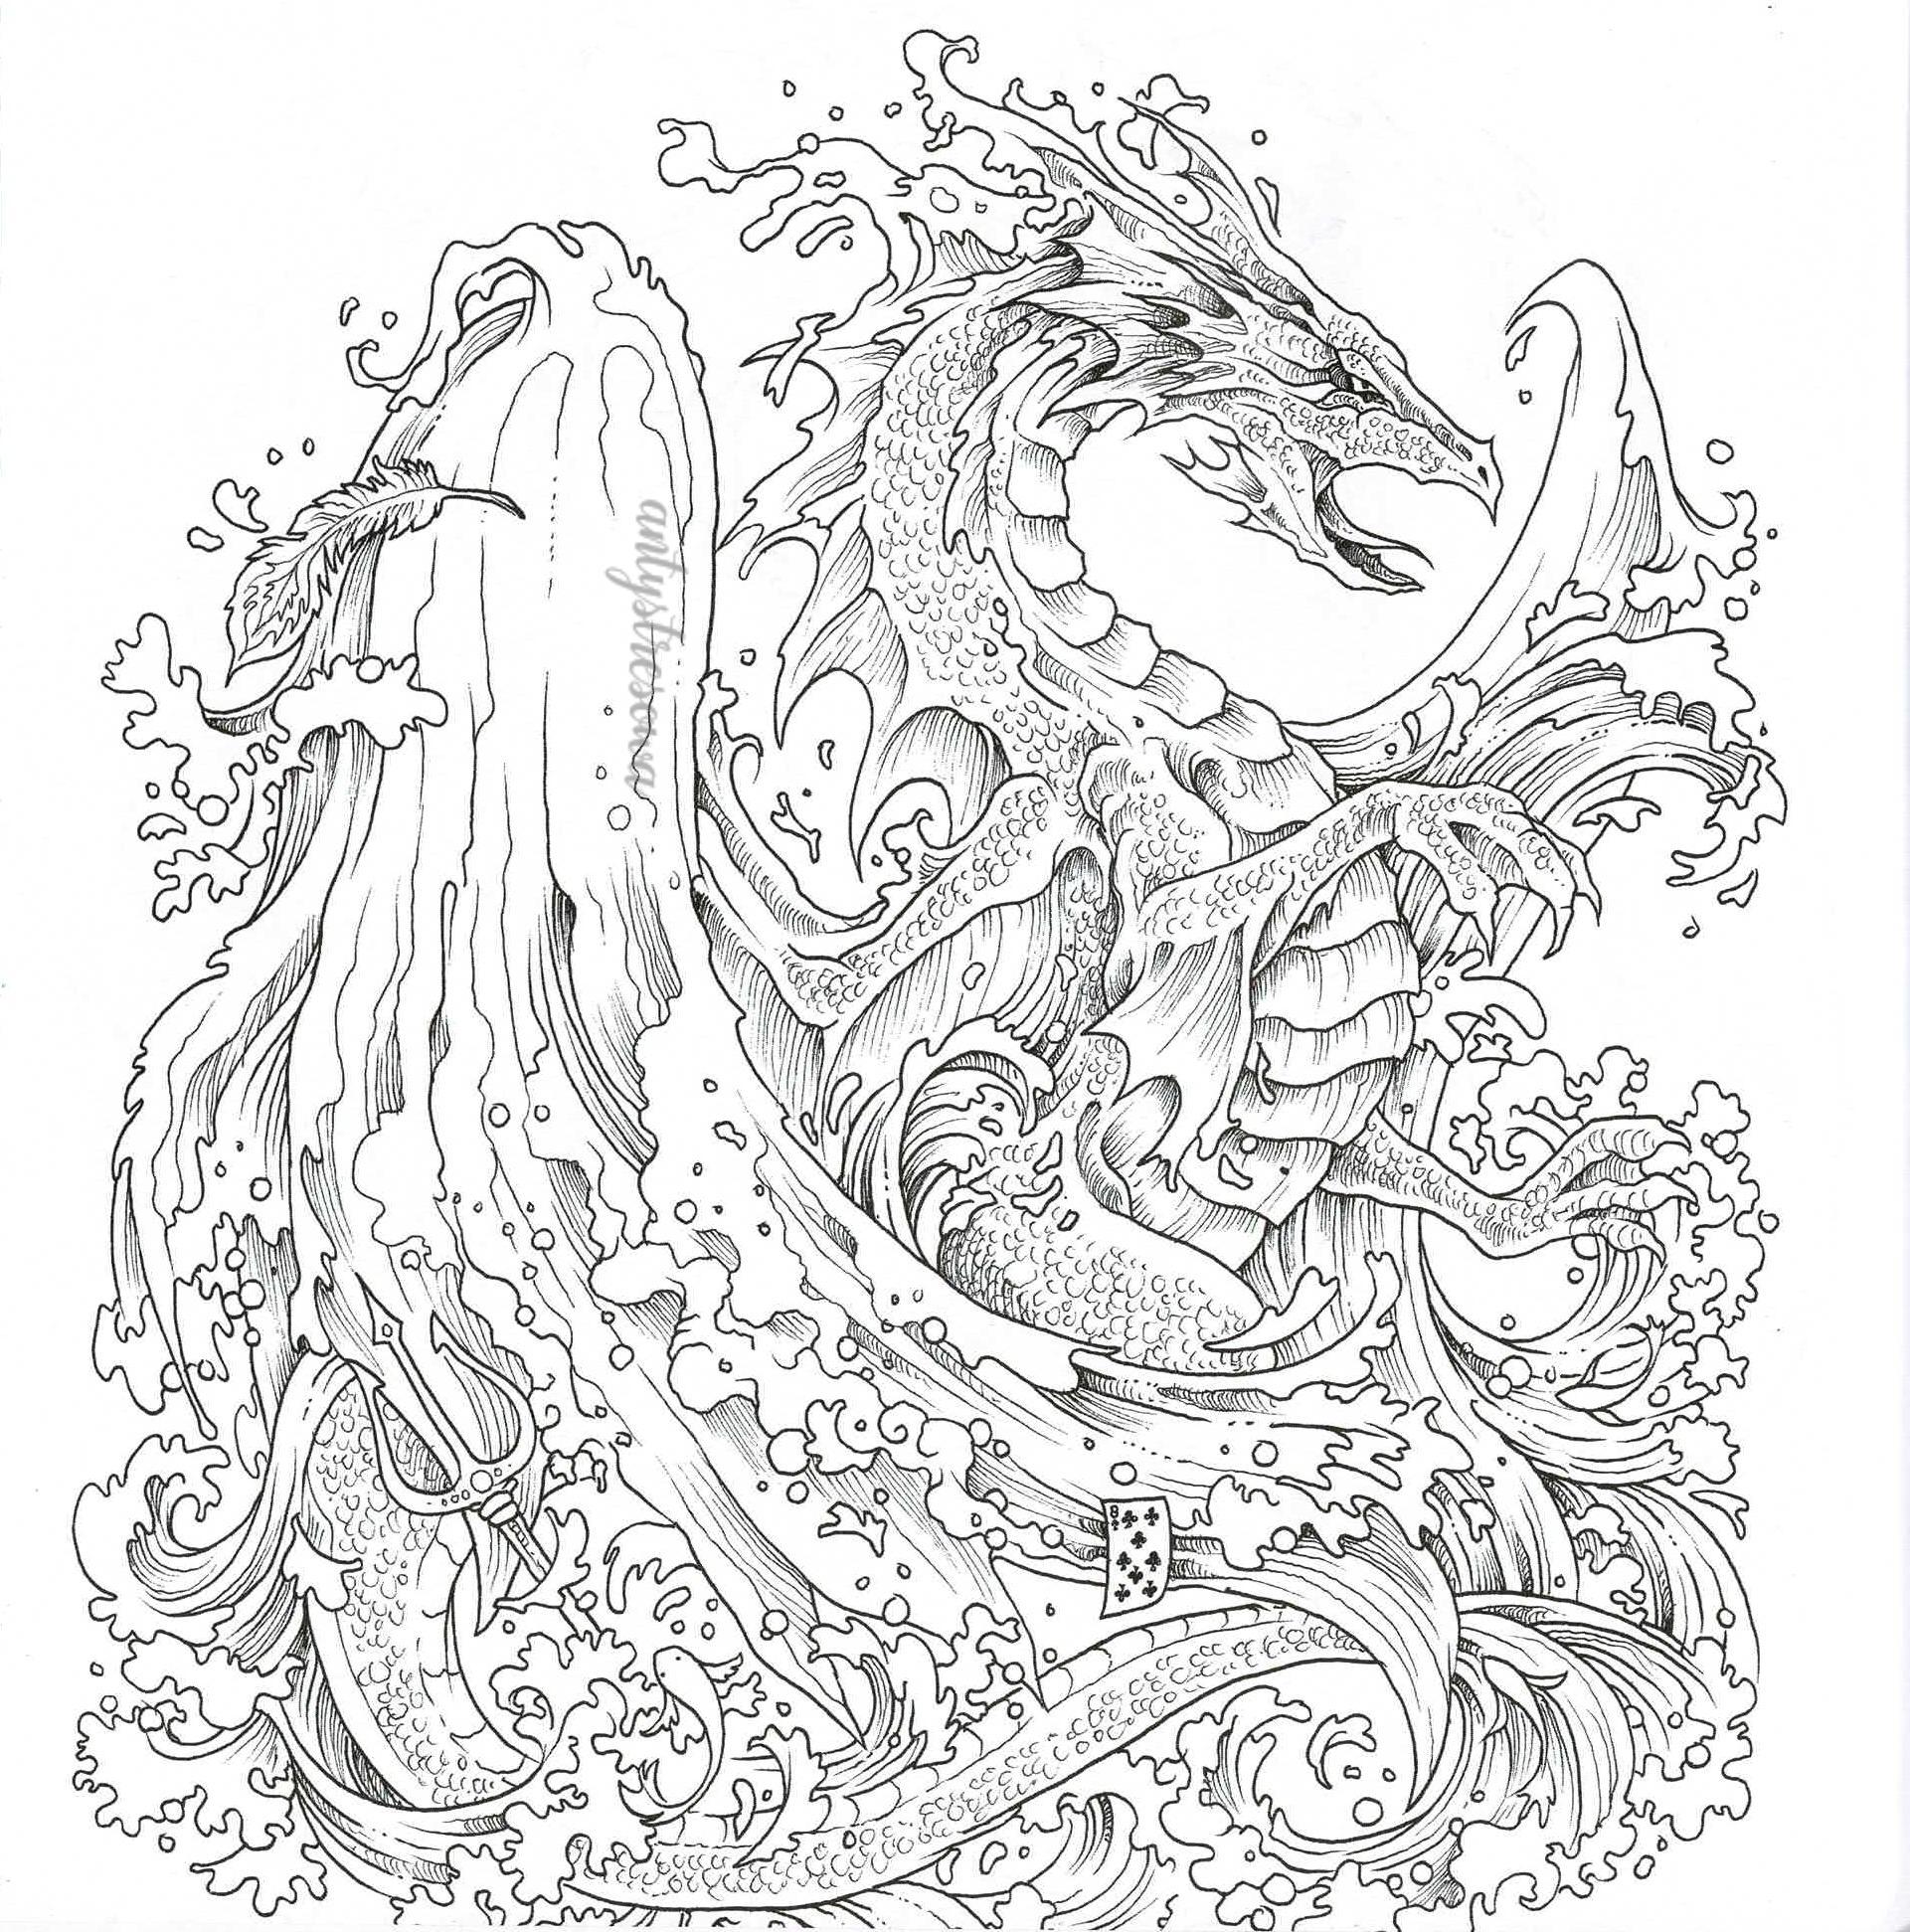 Smok wodny - Imagimorphia, Kerby Rosanes